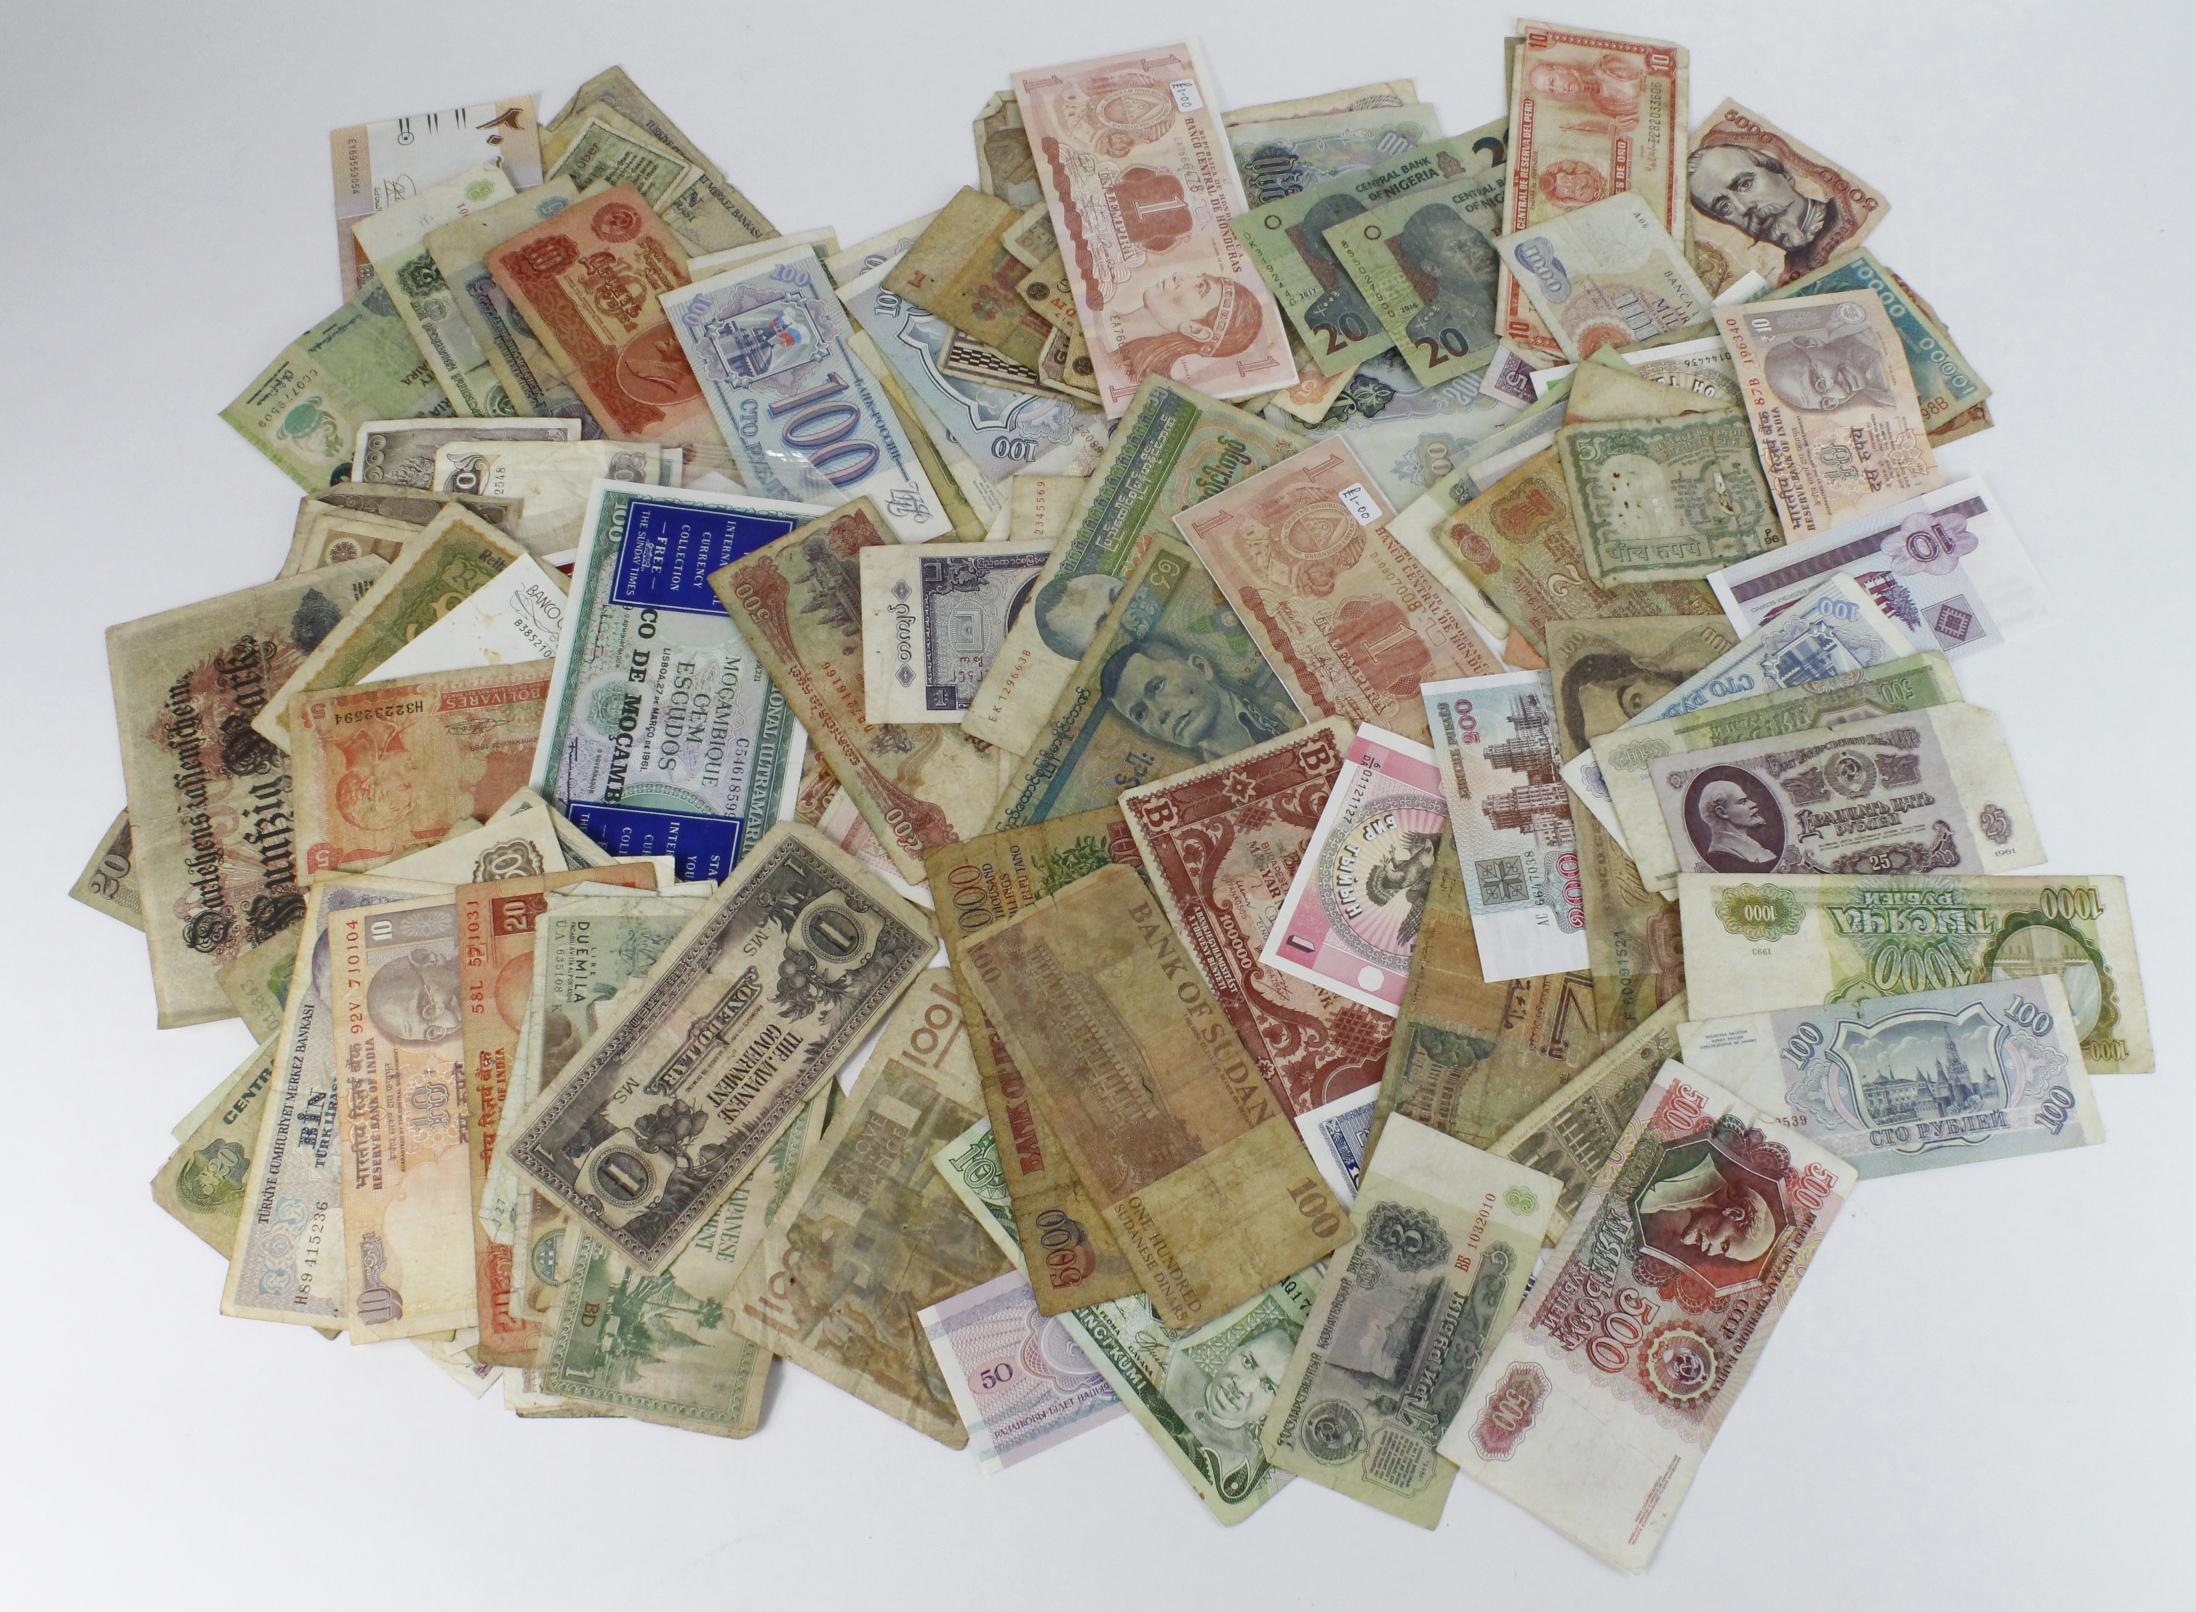 World (500+), large group in shoebox, some duplication, mixed grades - Image 3 of 3